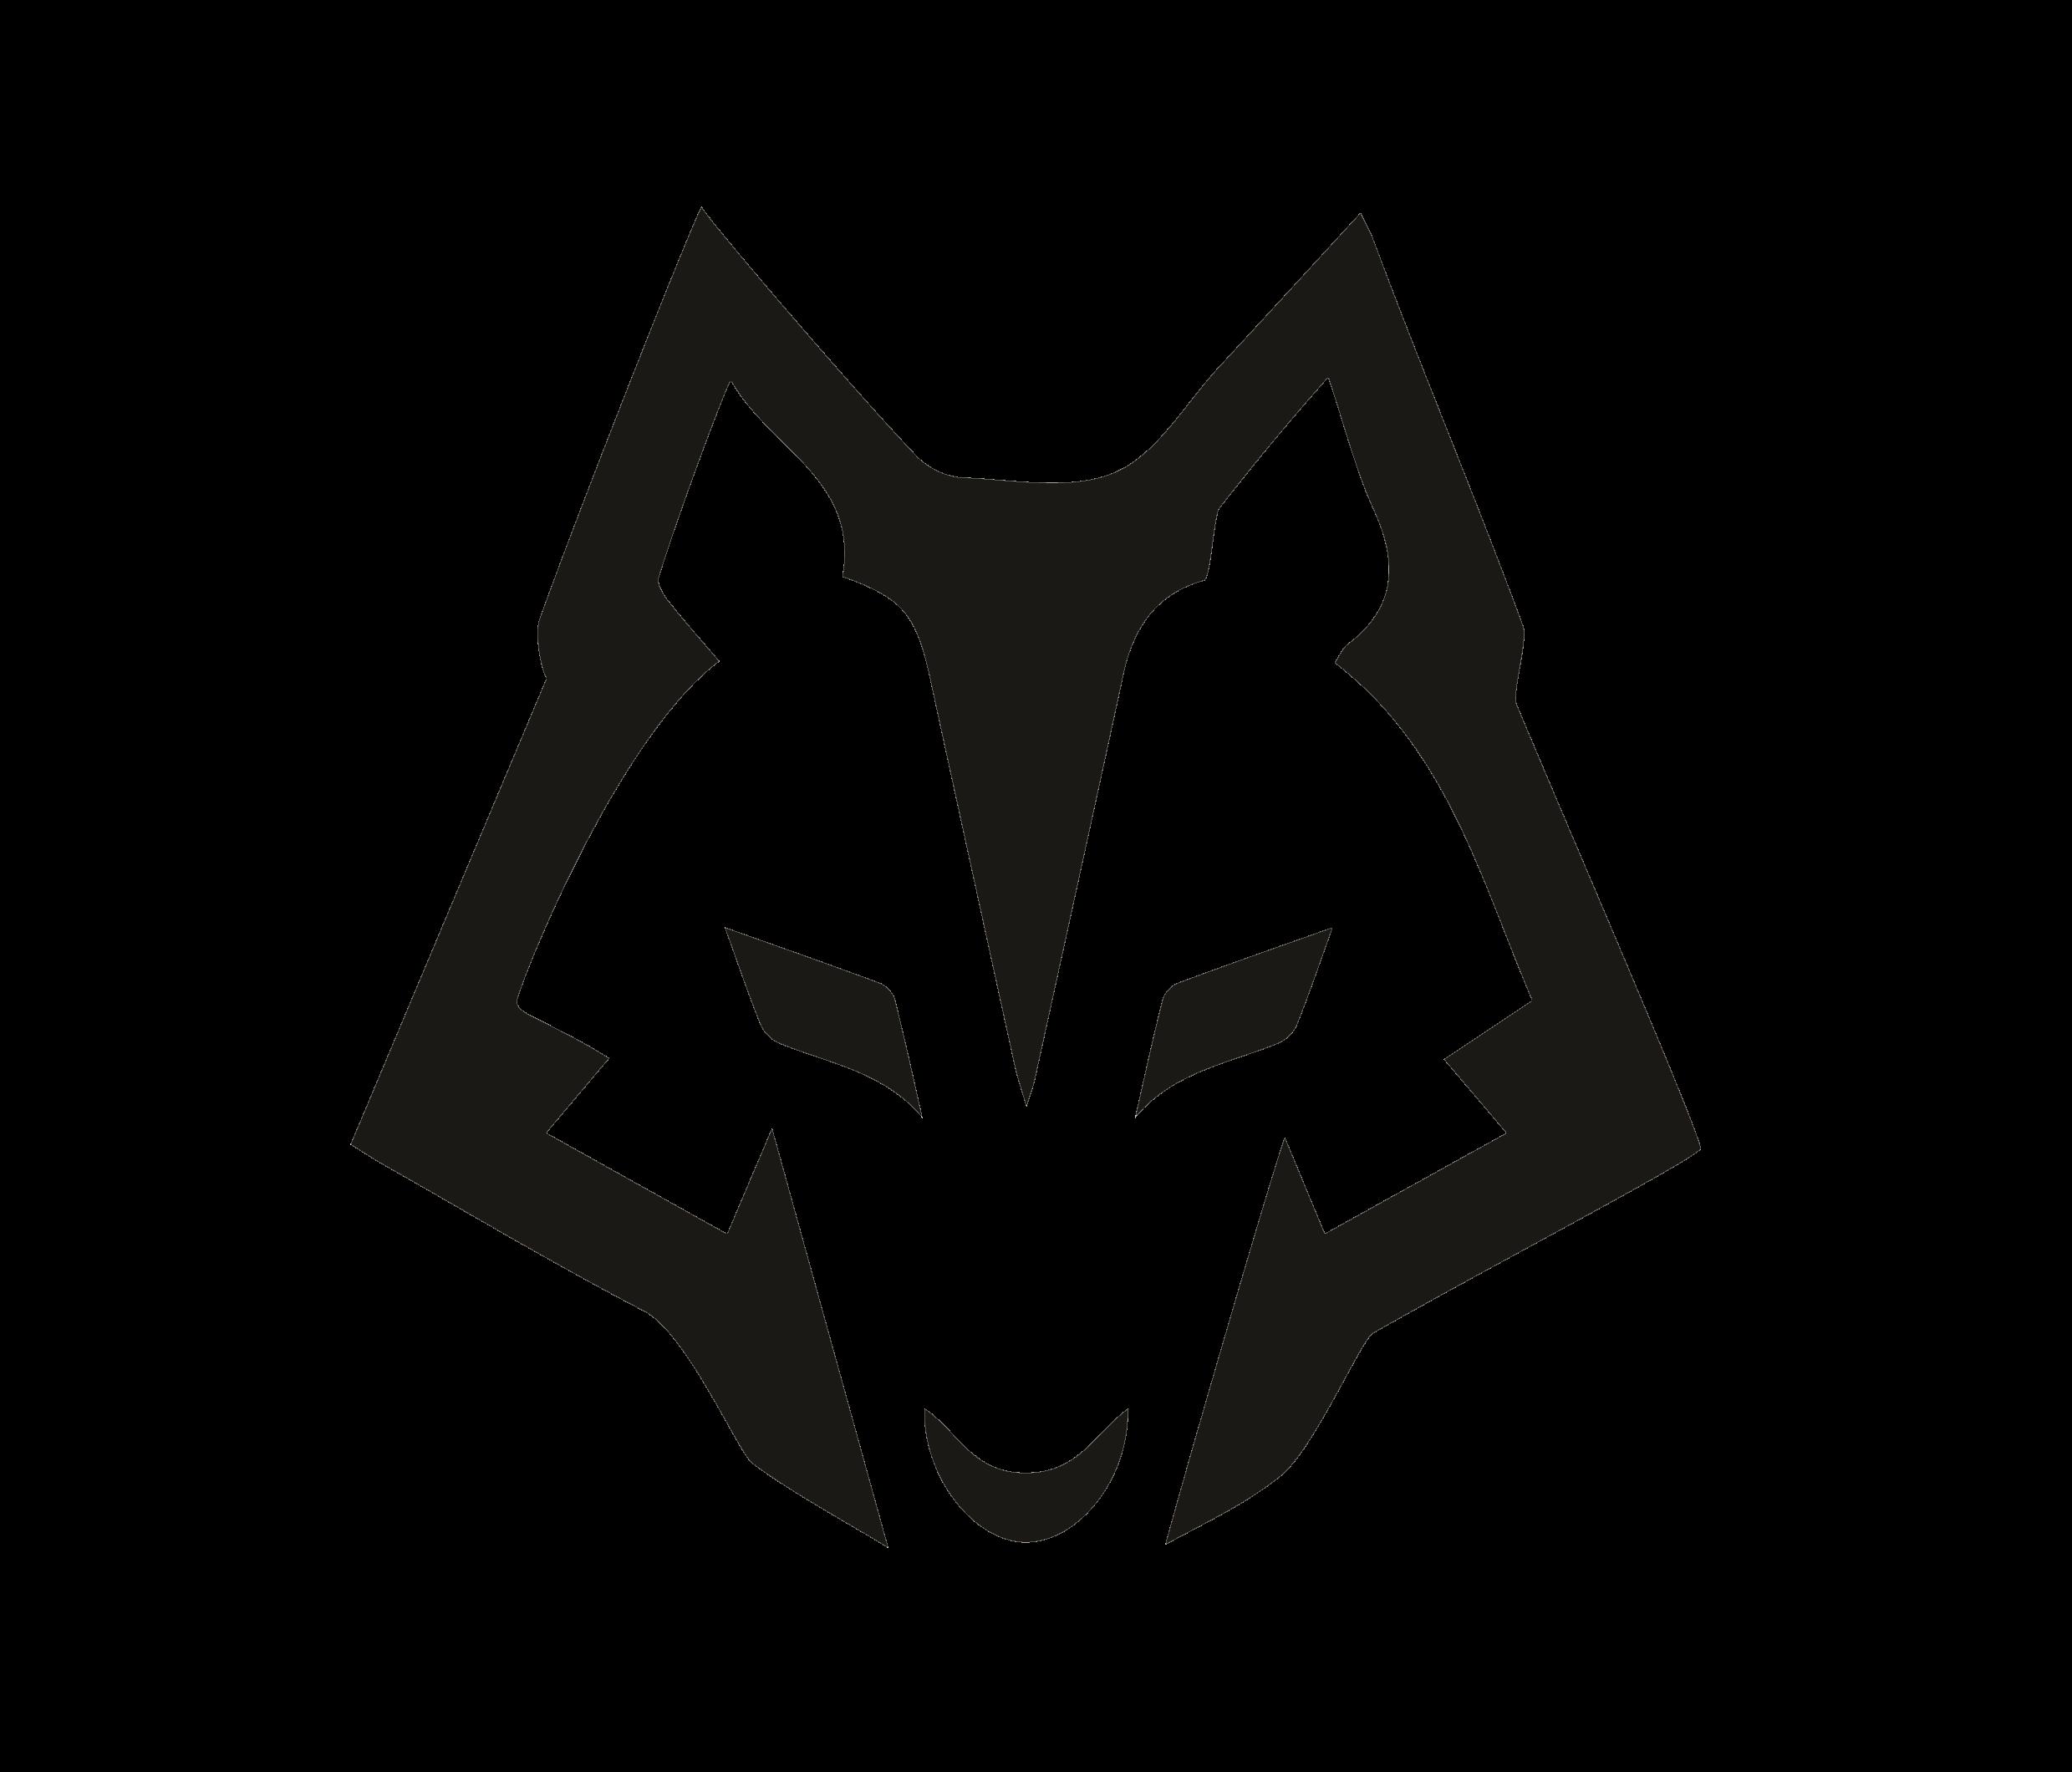 Wolfson College Students' Association Logo